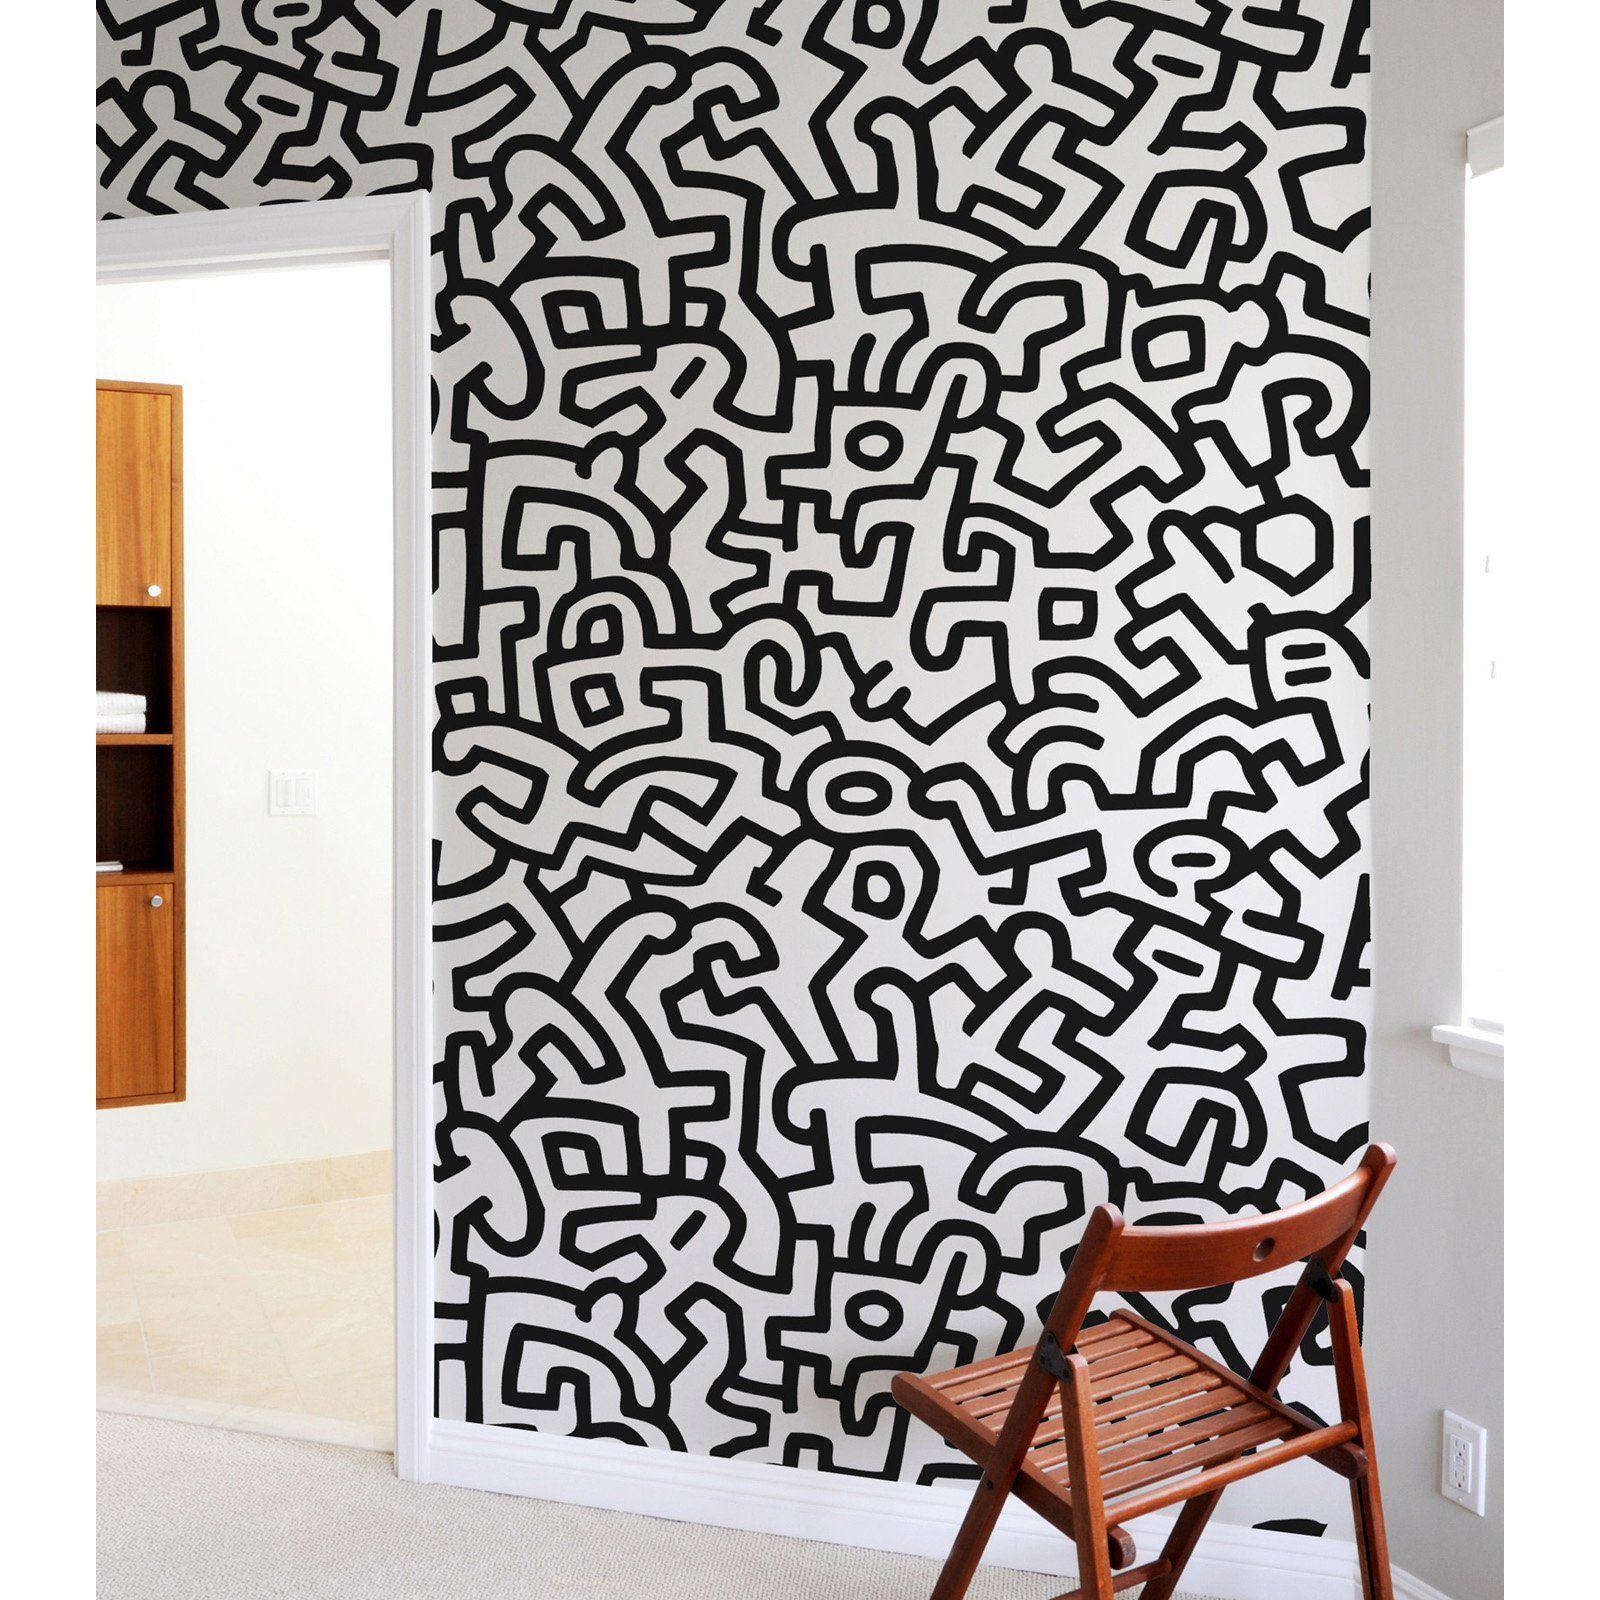 Blik Keith Haring Pattern Wall Tiles   BKH 110 PWT BLACK_WHITE